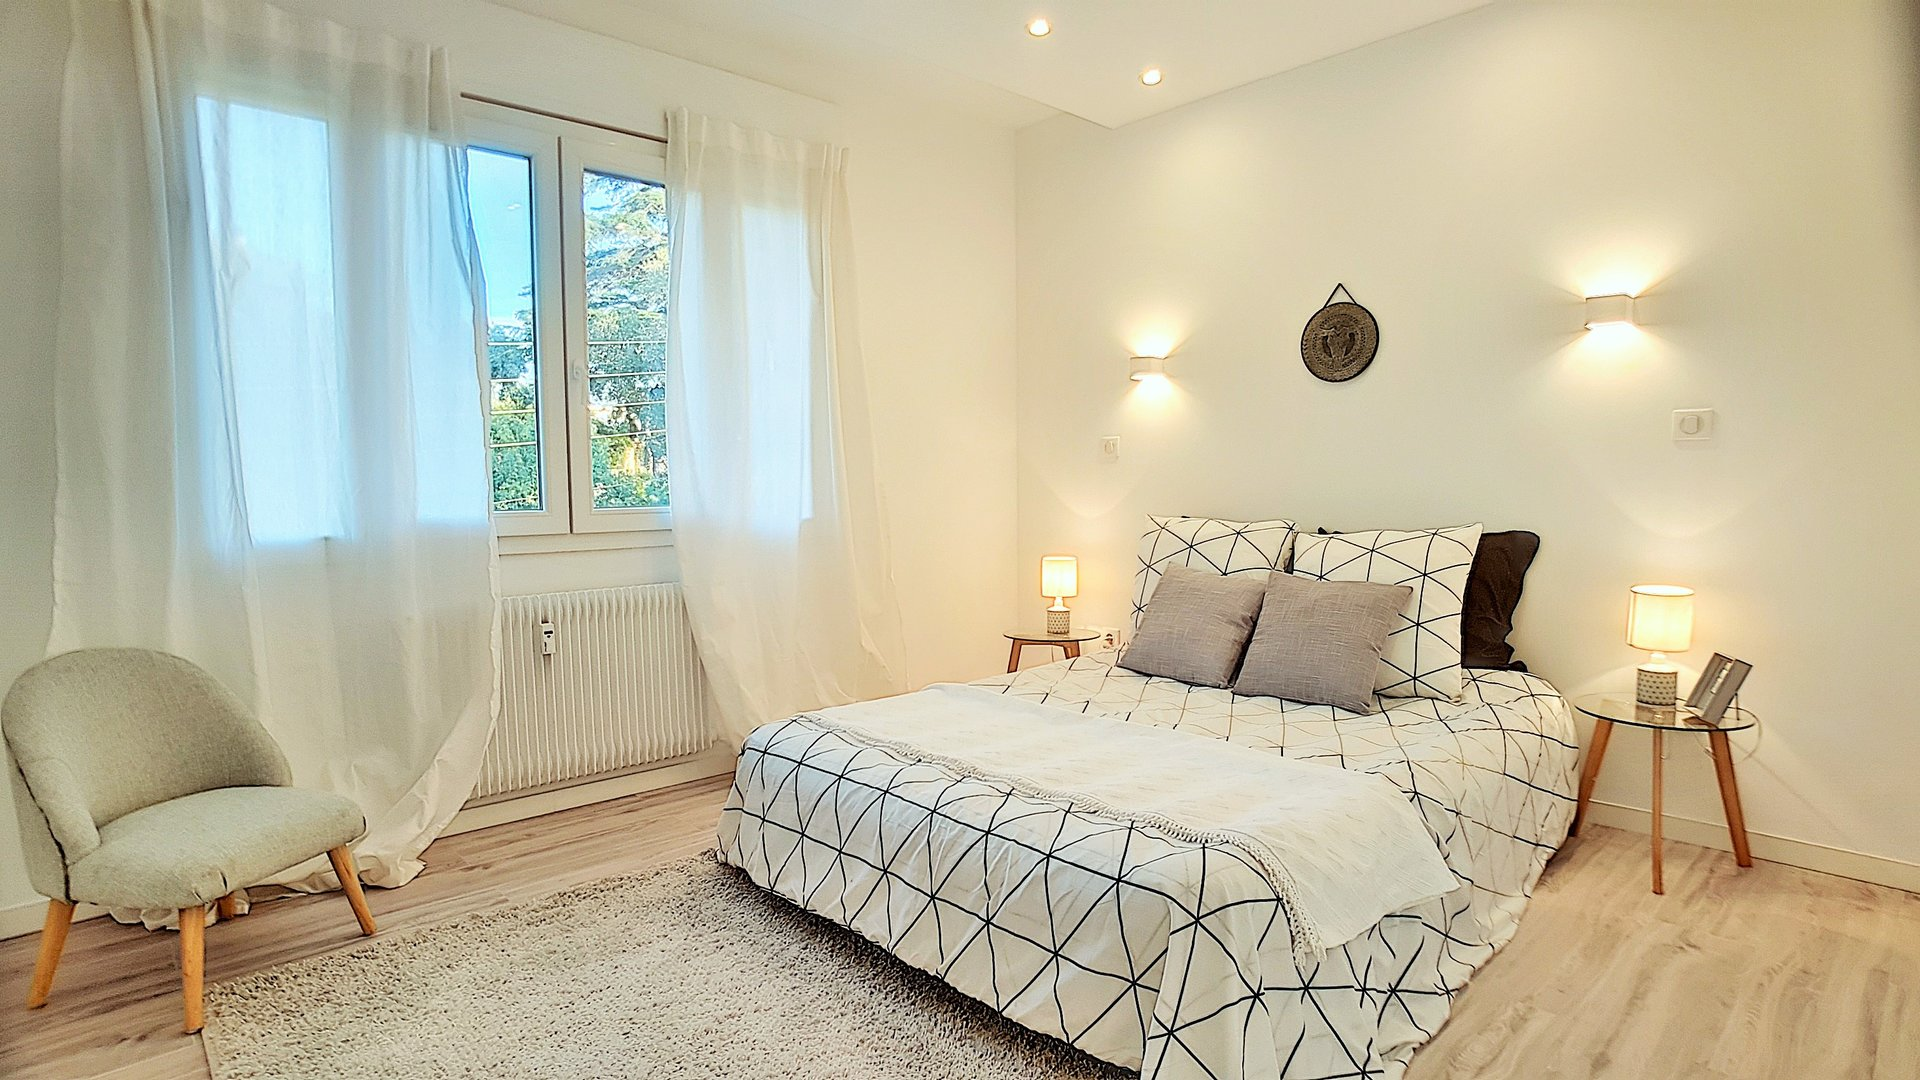 Cannes see view, 3-room apartment 2 berooms flat, top floor,, 75 m², garag